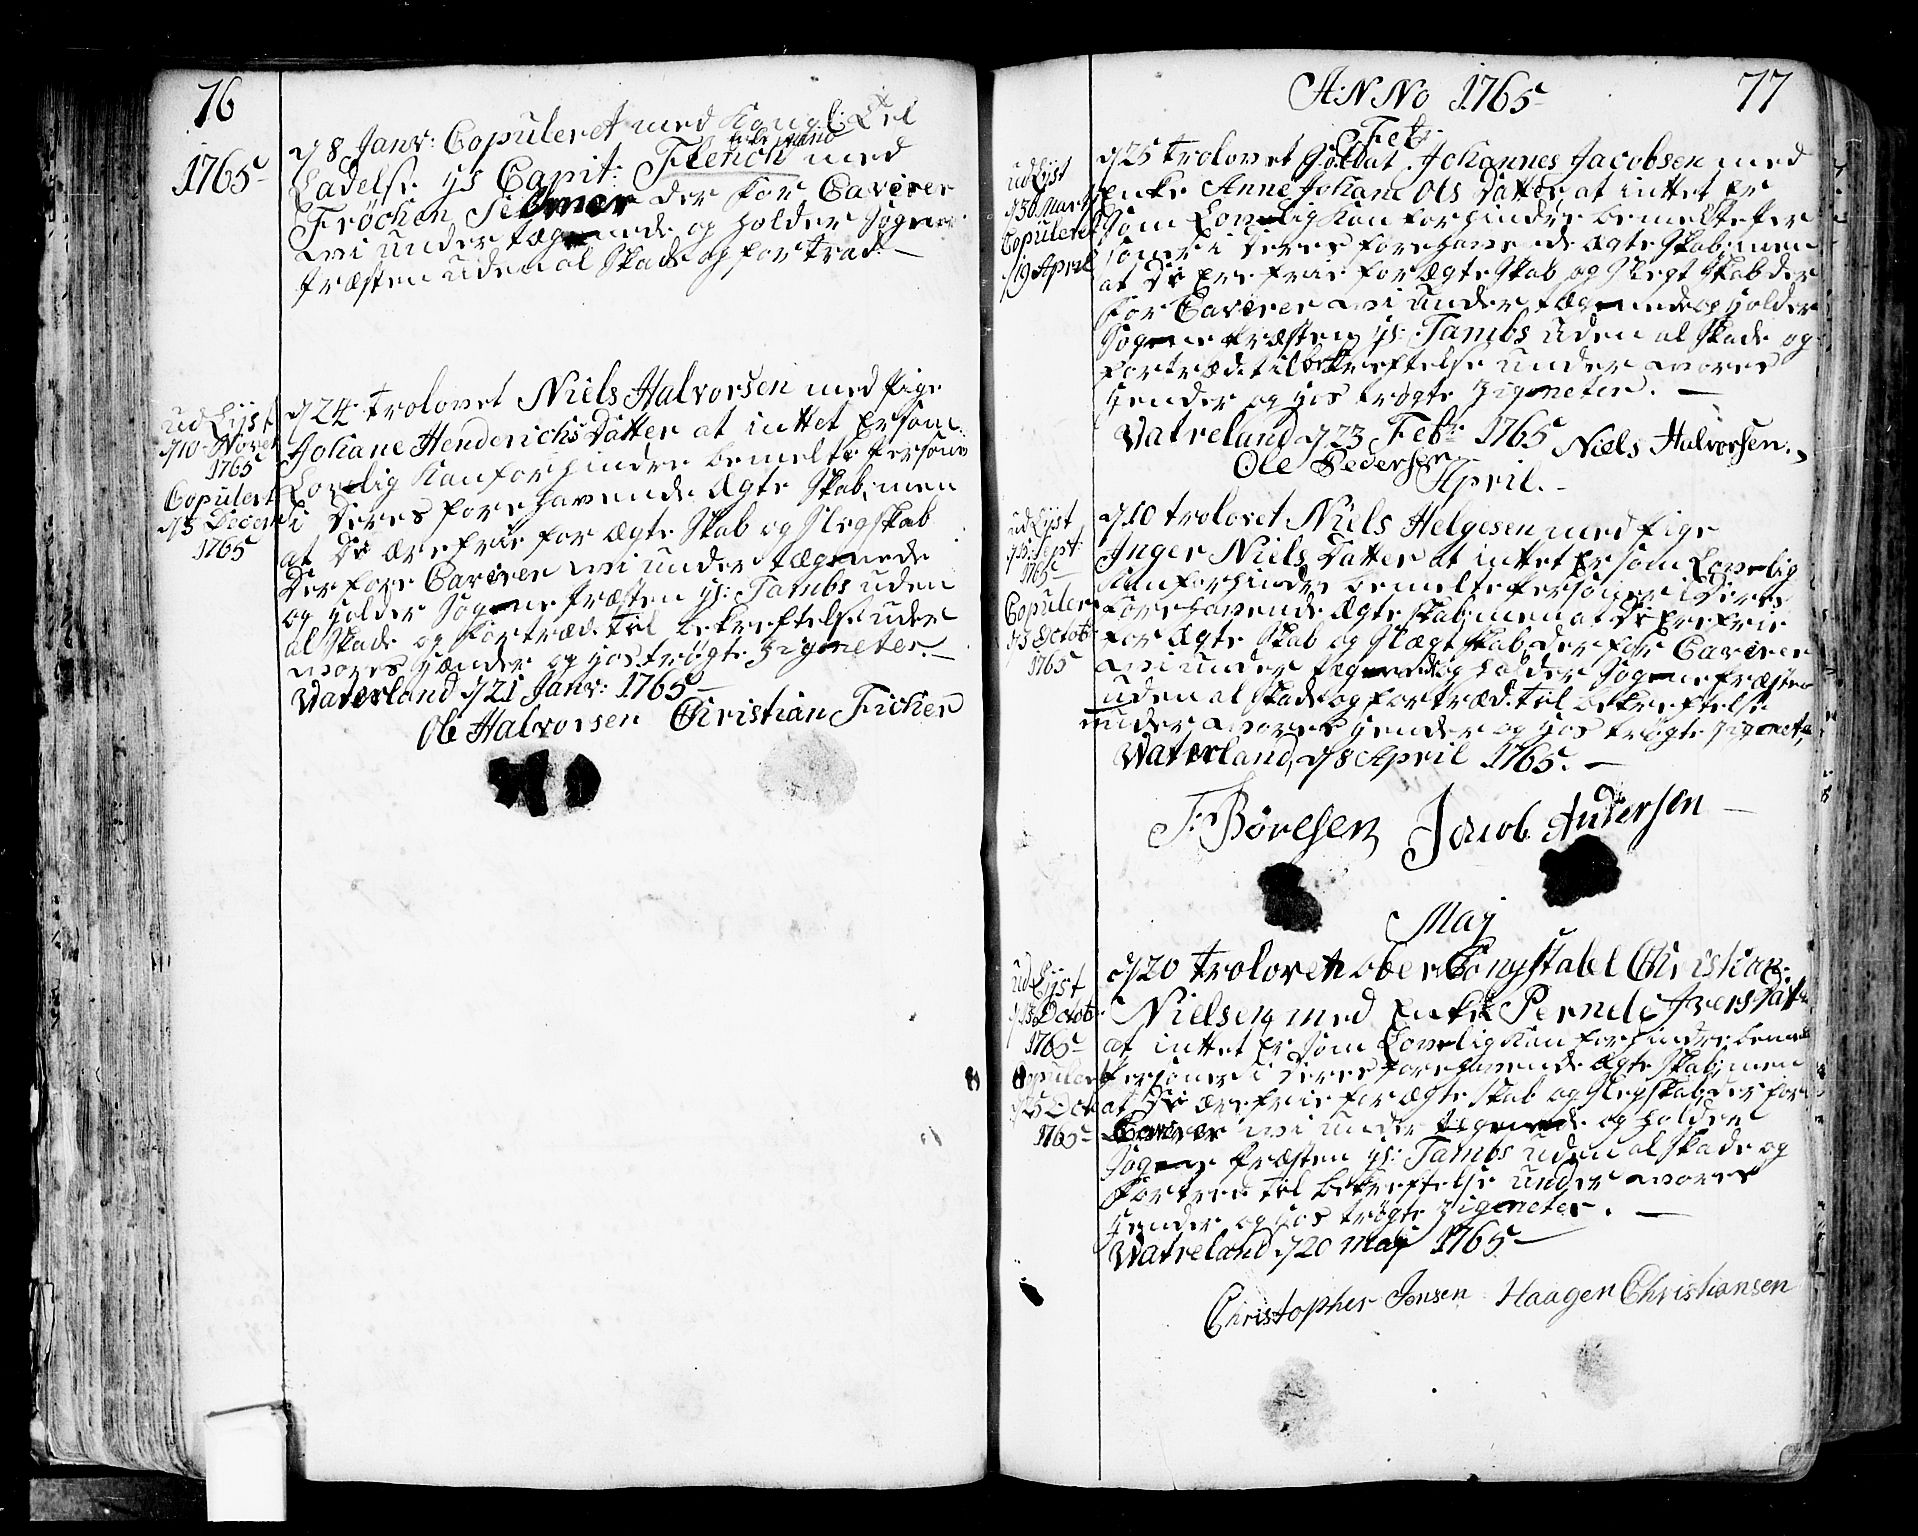 SAO, Fredrikstad prestekontor Kirkebøker, F/Fa/L0002: Parish register (official) no. 2, 1750-1804, p. 76-77